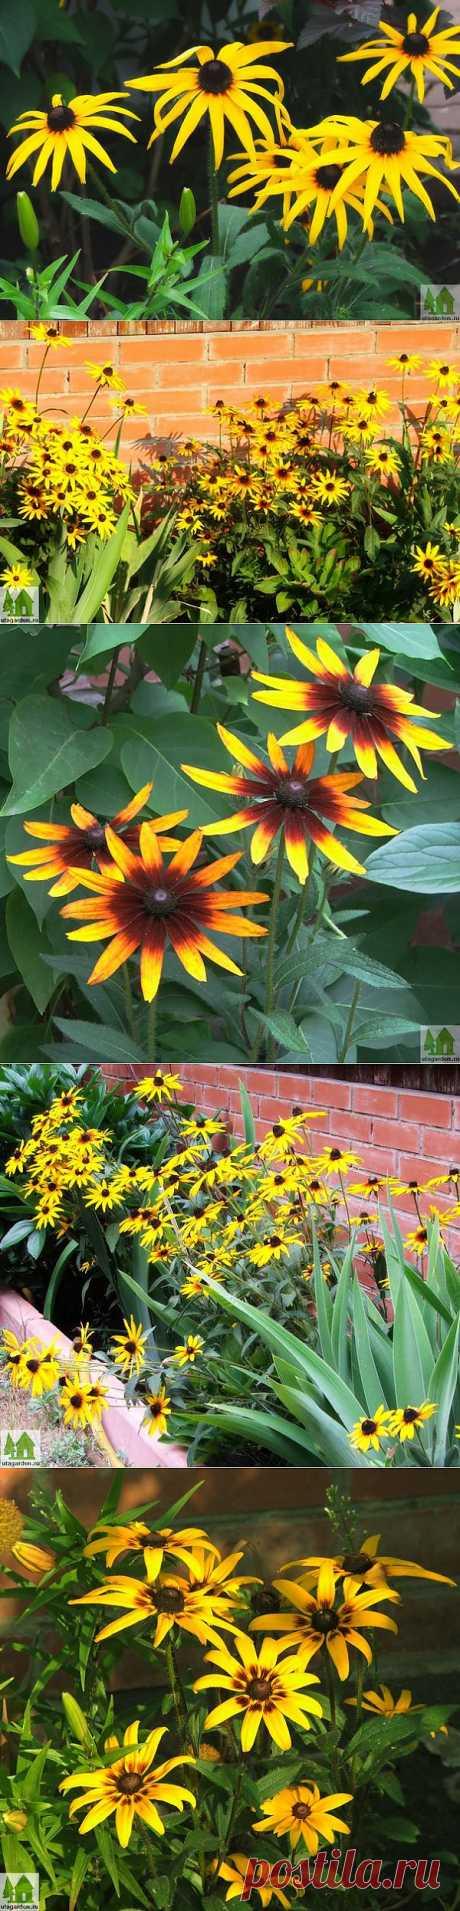 Фото рудбекии | Дачная жизнь - сад, огород, дача